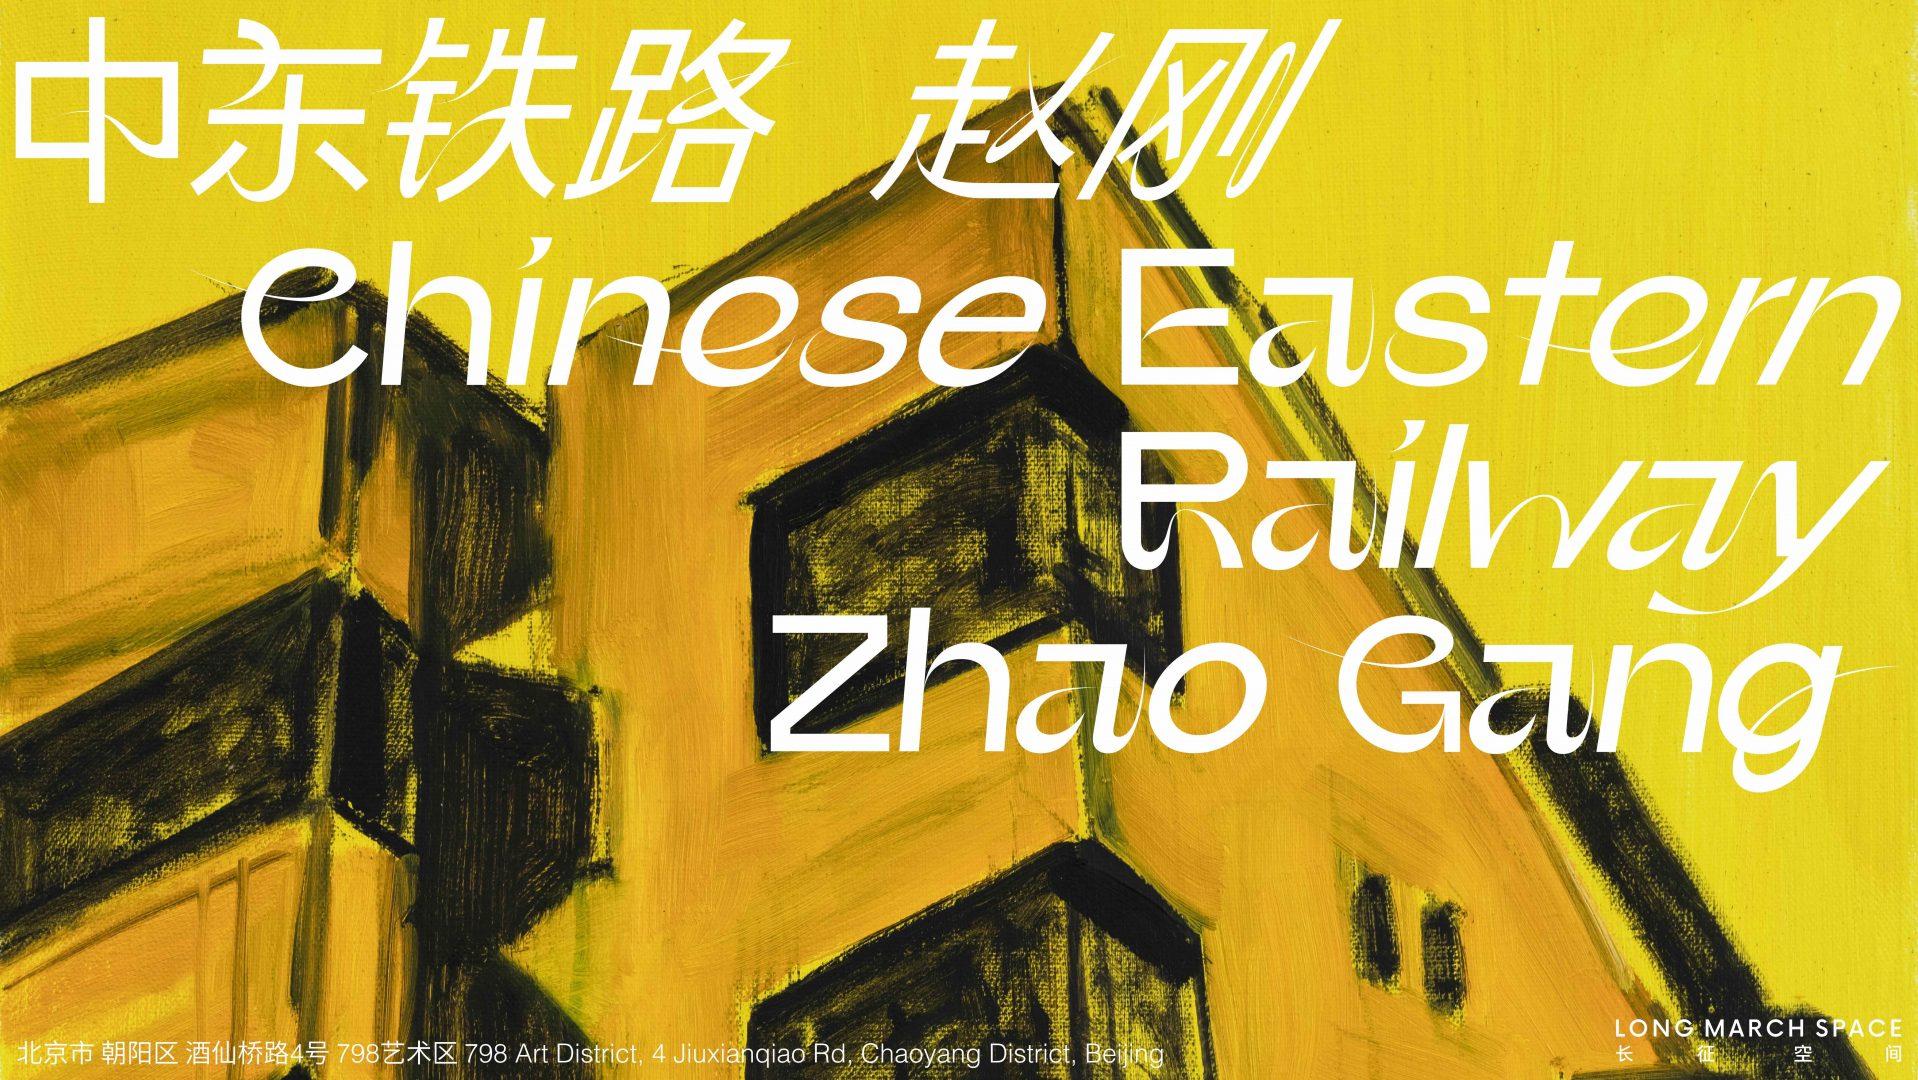 Chinese Eastern Railway: Zhao Gang